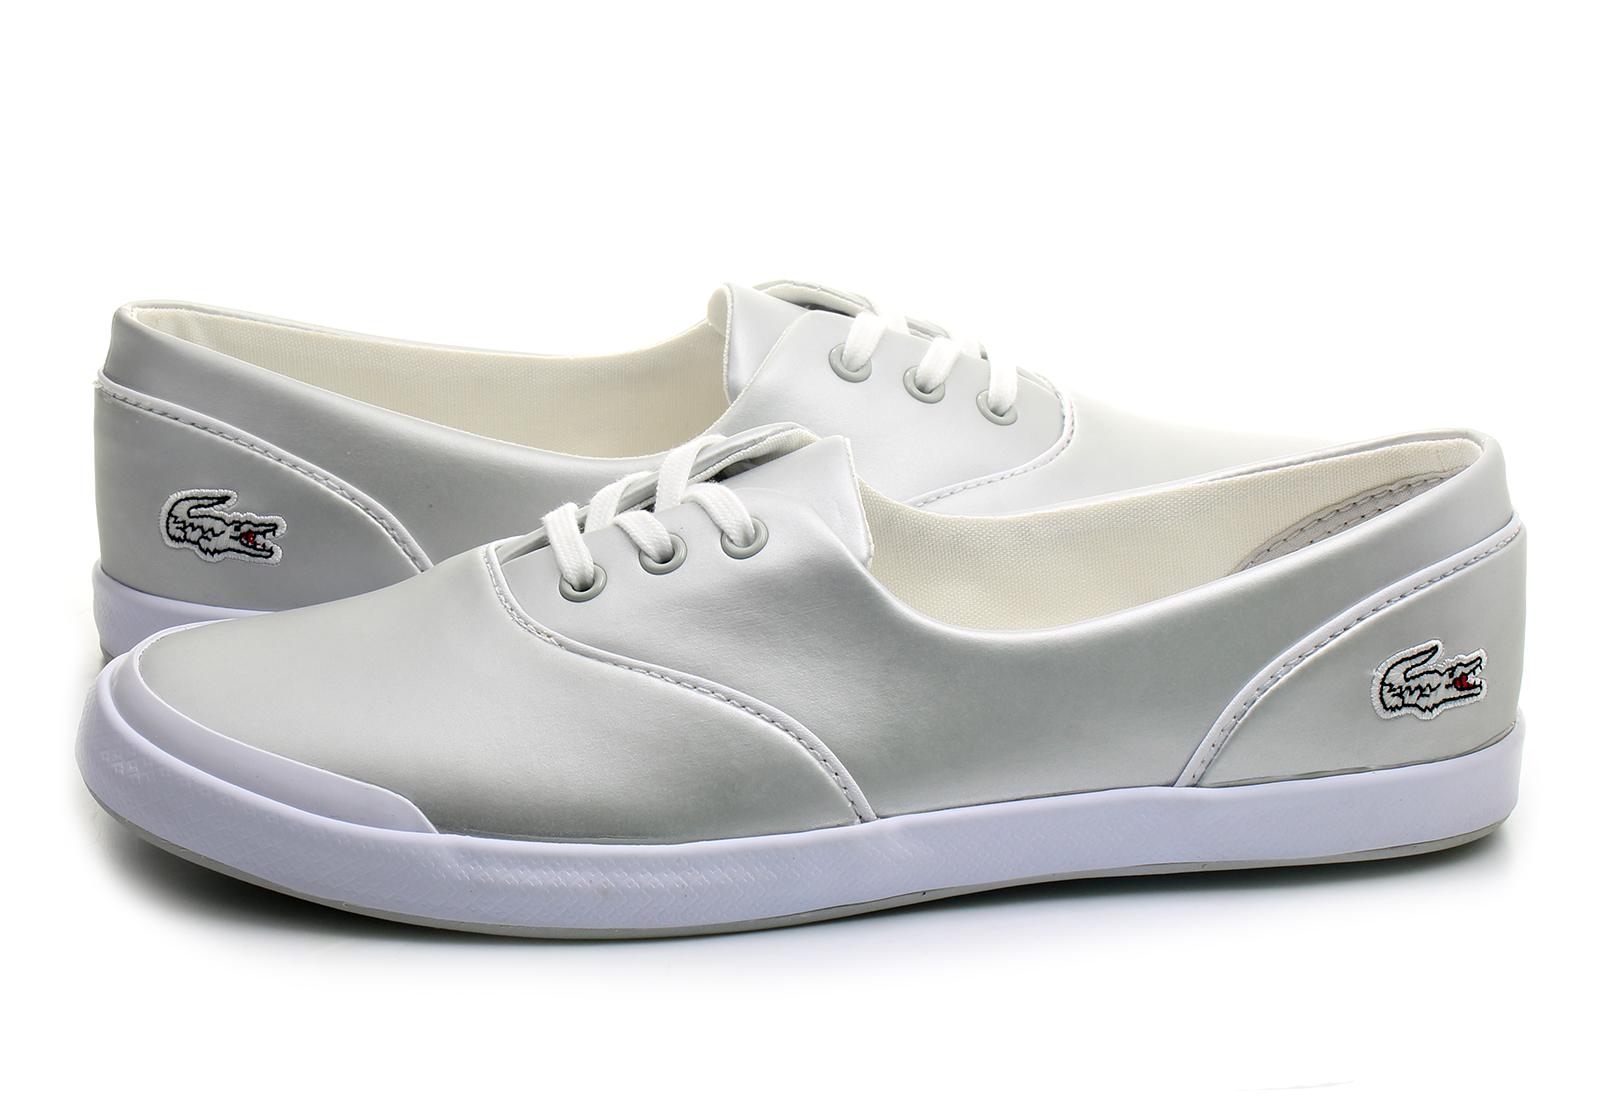 Lacoste Cipő - lancelle 3-eye - 171caw1031-334 - Office Shoes ... 1cdad137a7